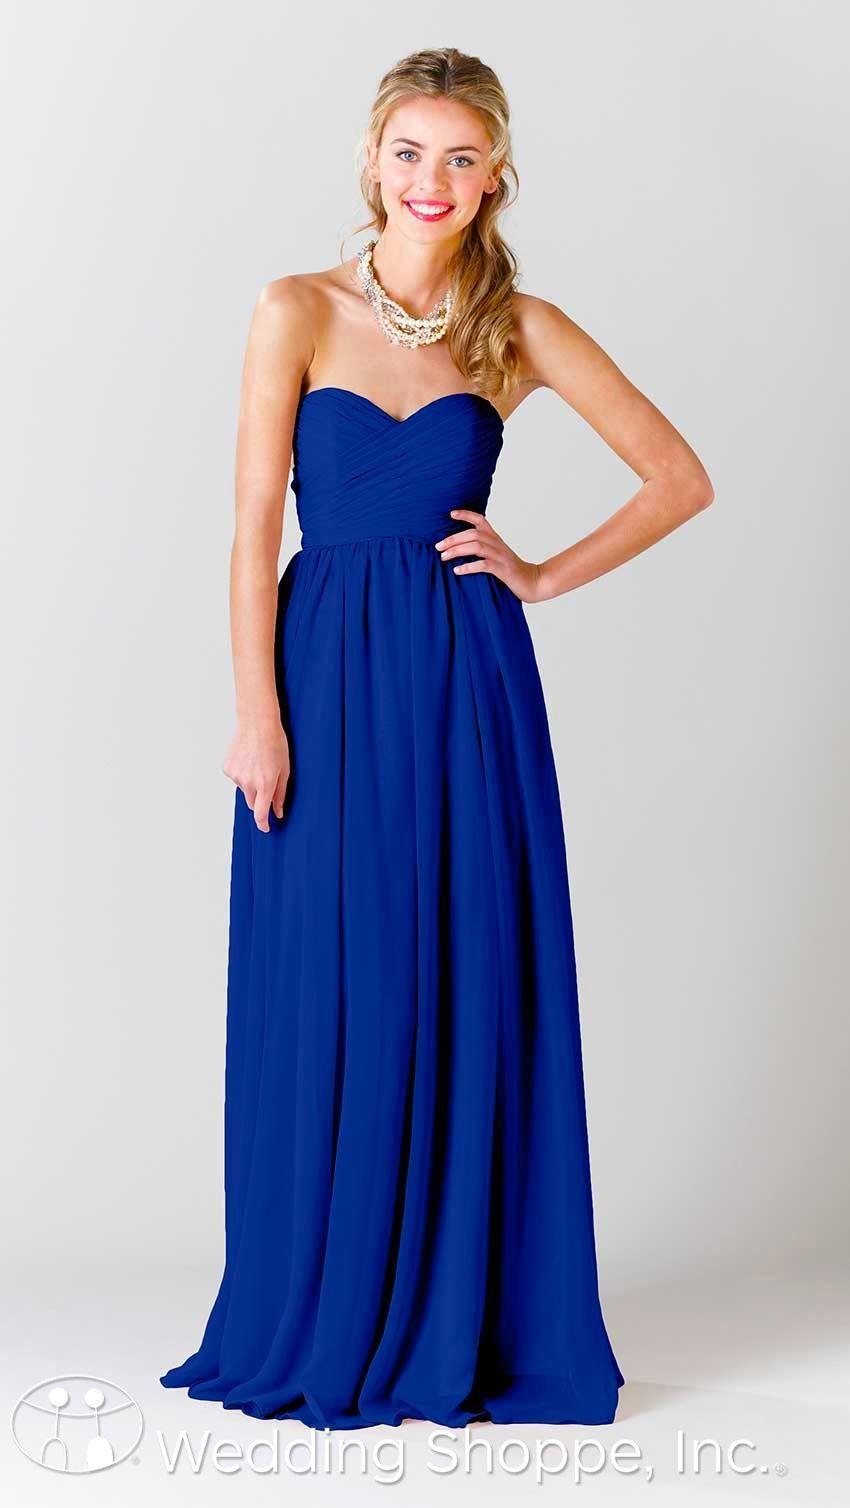 Kennedy Blue Bridesmaid Dress Olivia   28101 in 2019  d7758d5a58e1